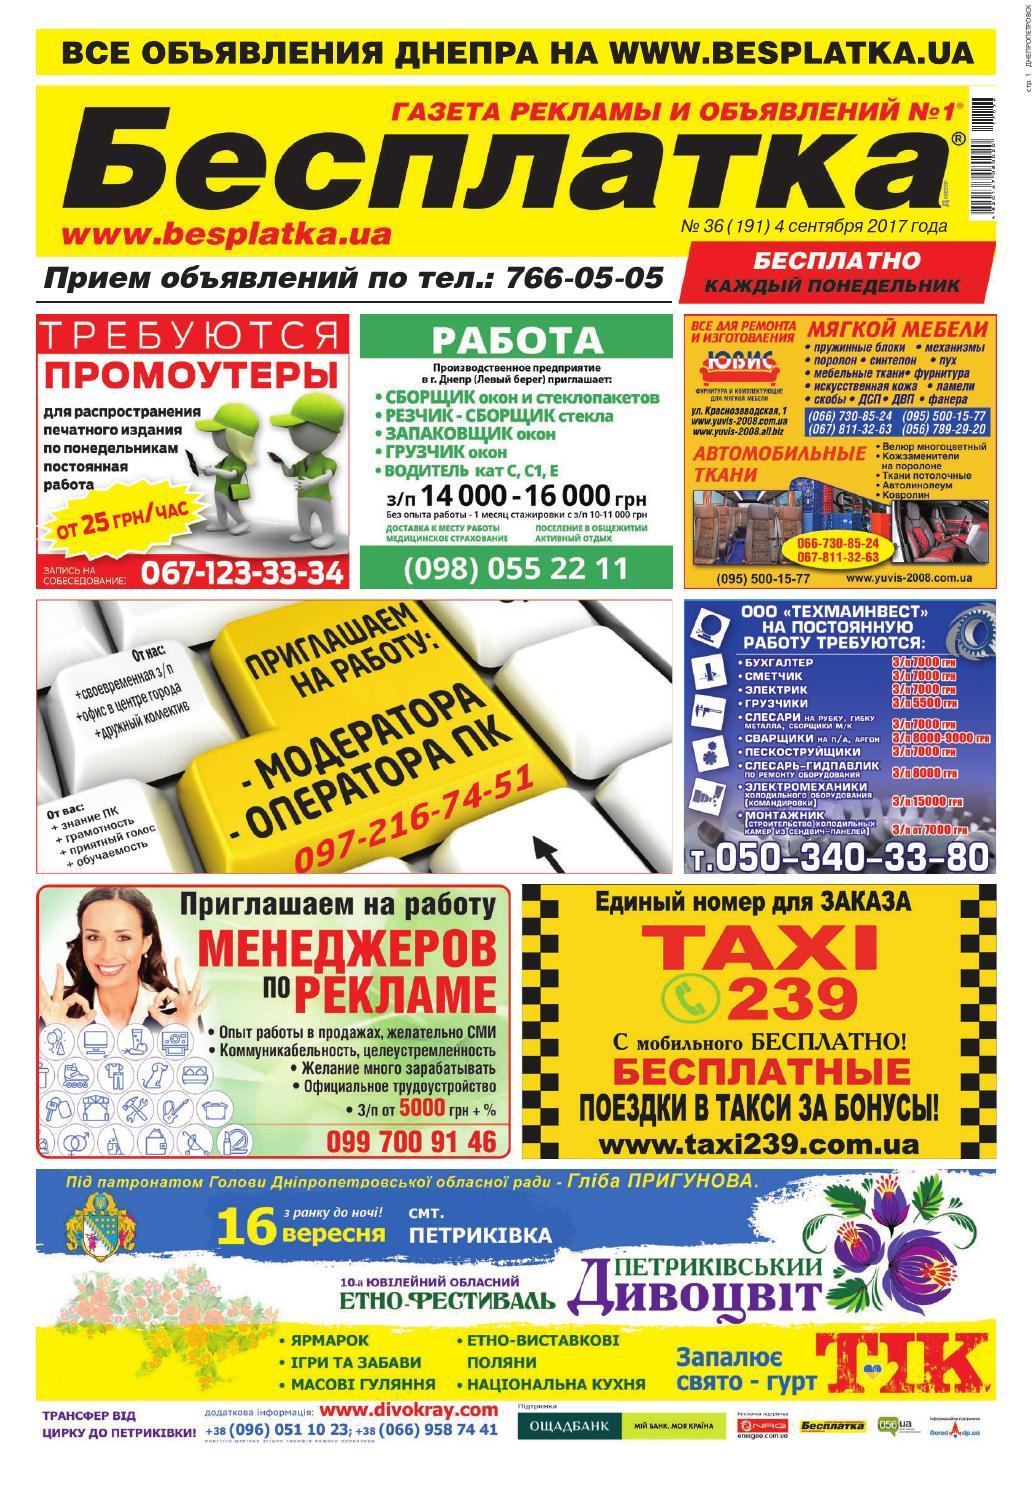 64a6dae67e92 Besplatka  36 Днепр by besplatka ukraine - issuu